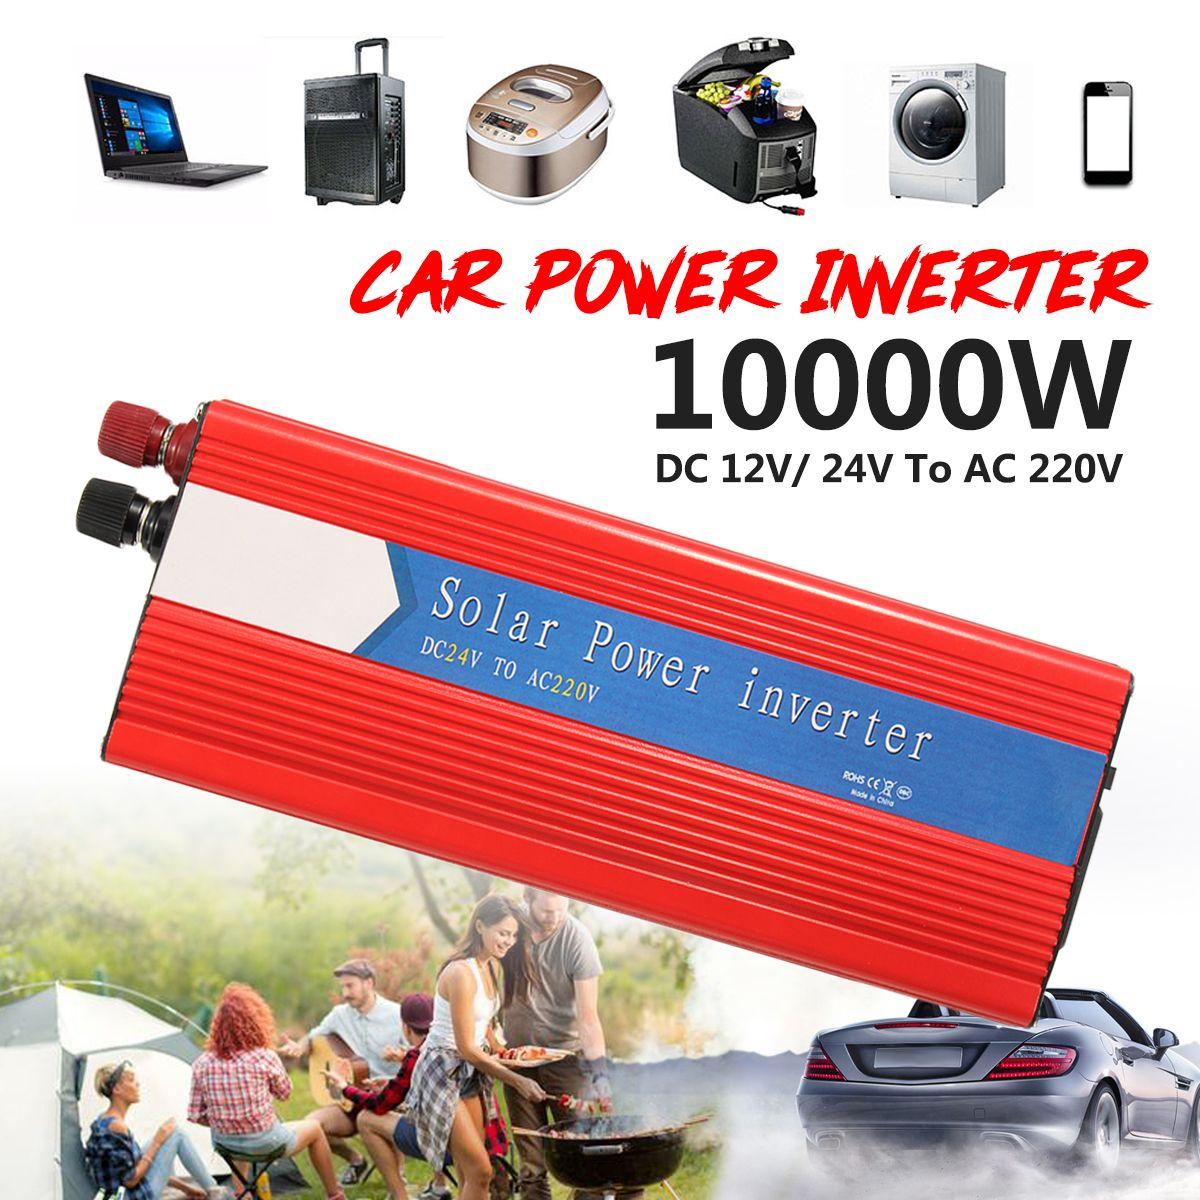 Voltage Transformer PEAK 10000W Car Power Inverter 12/24V To AC 220/110V USB Modified Sine Wave Red Universal Intelligent